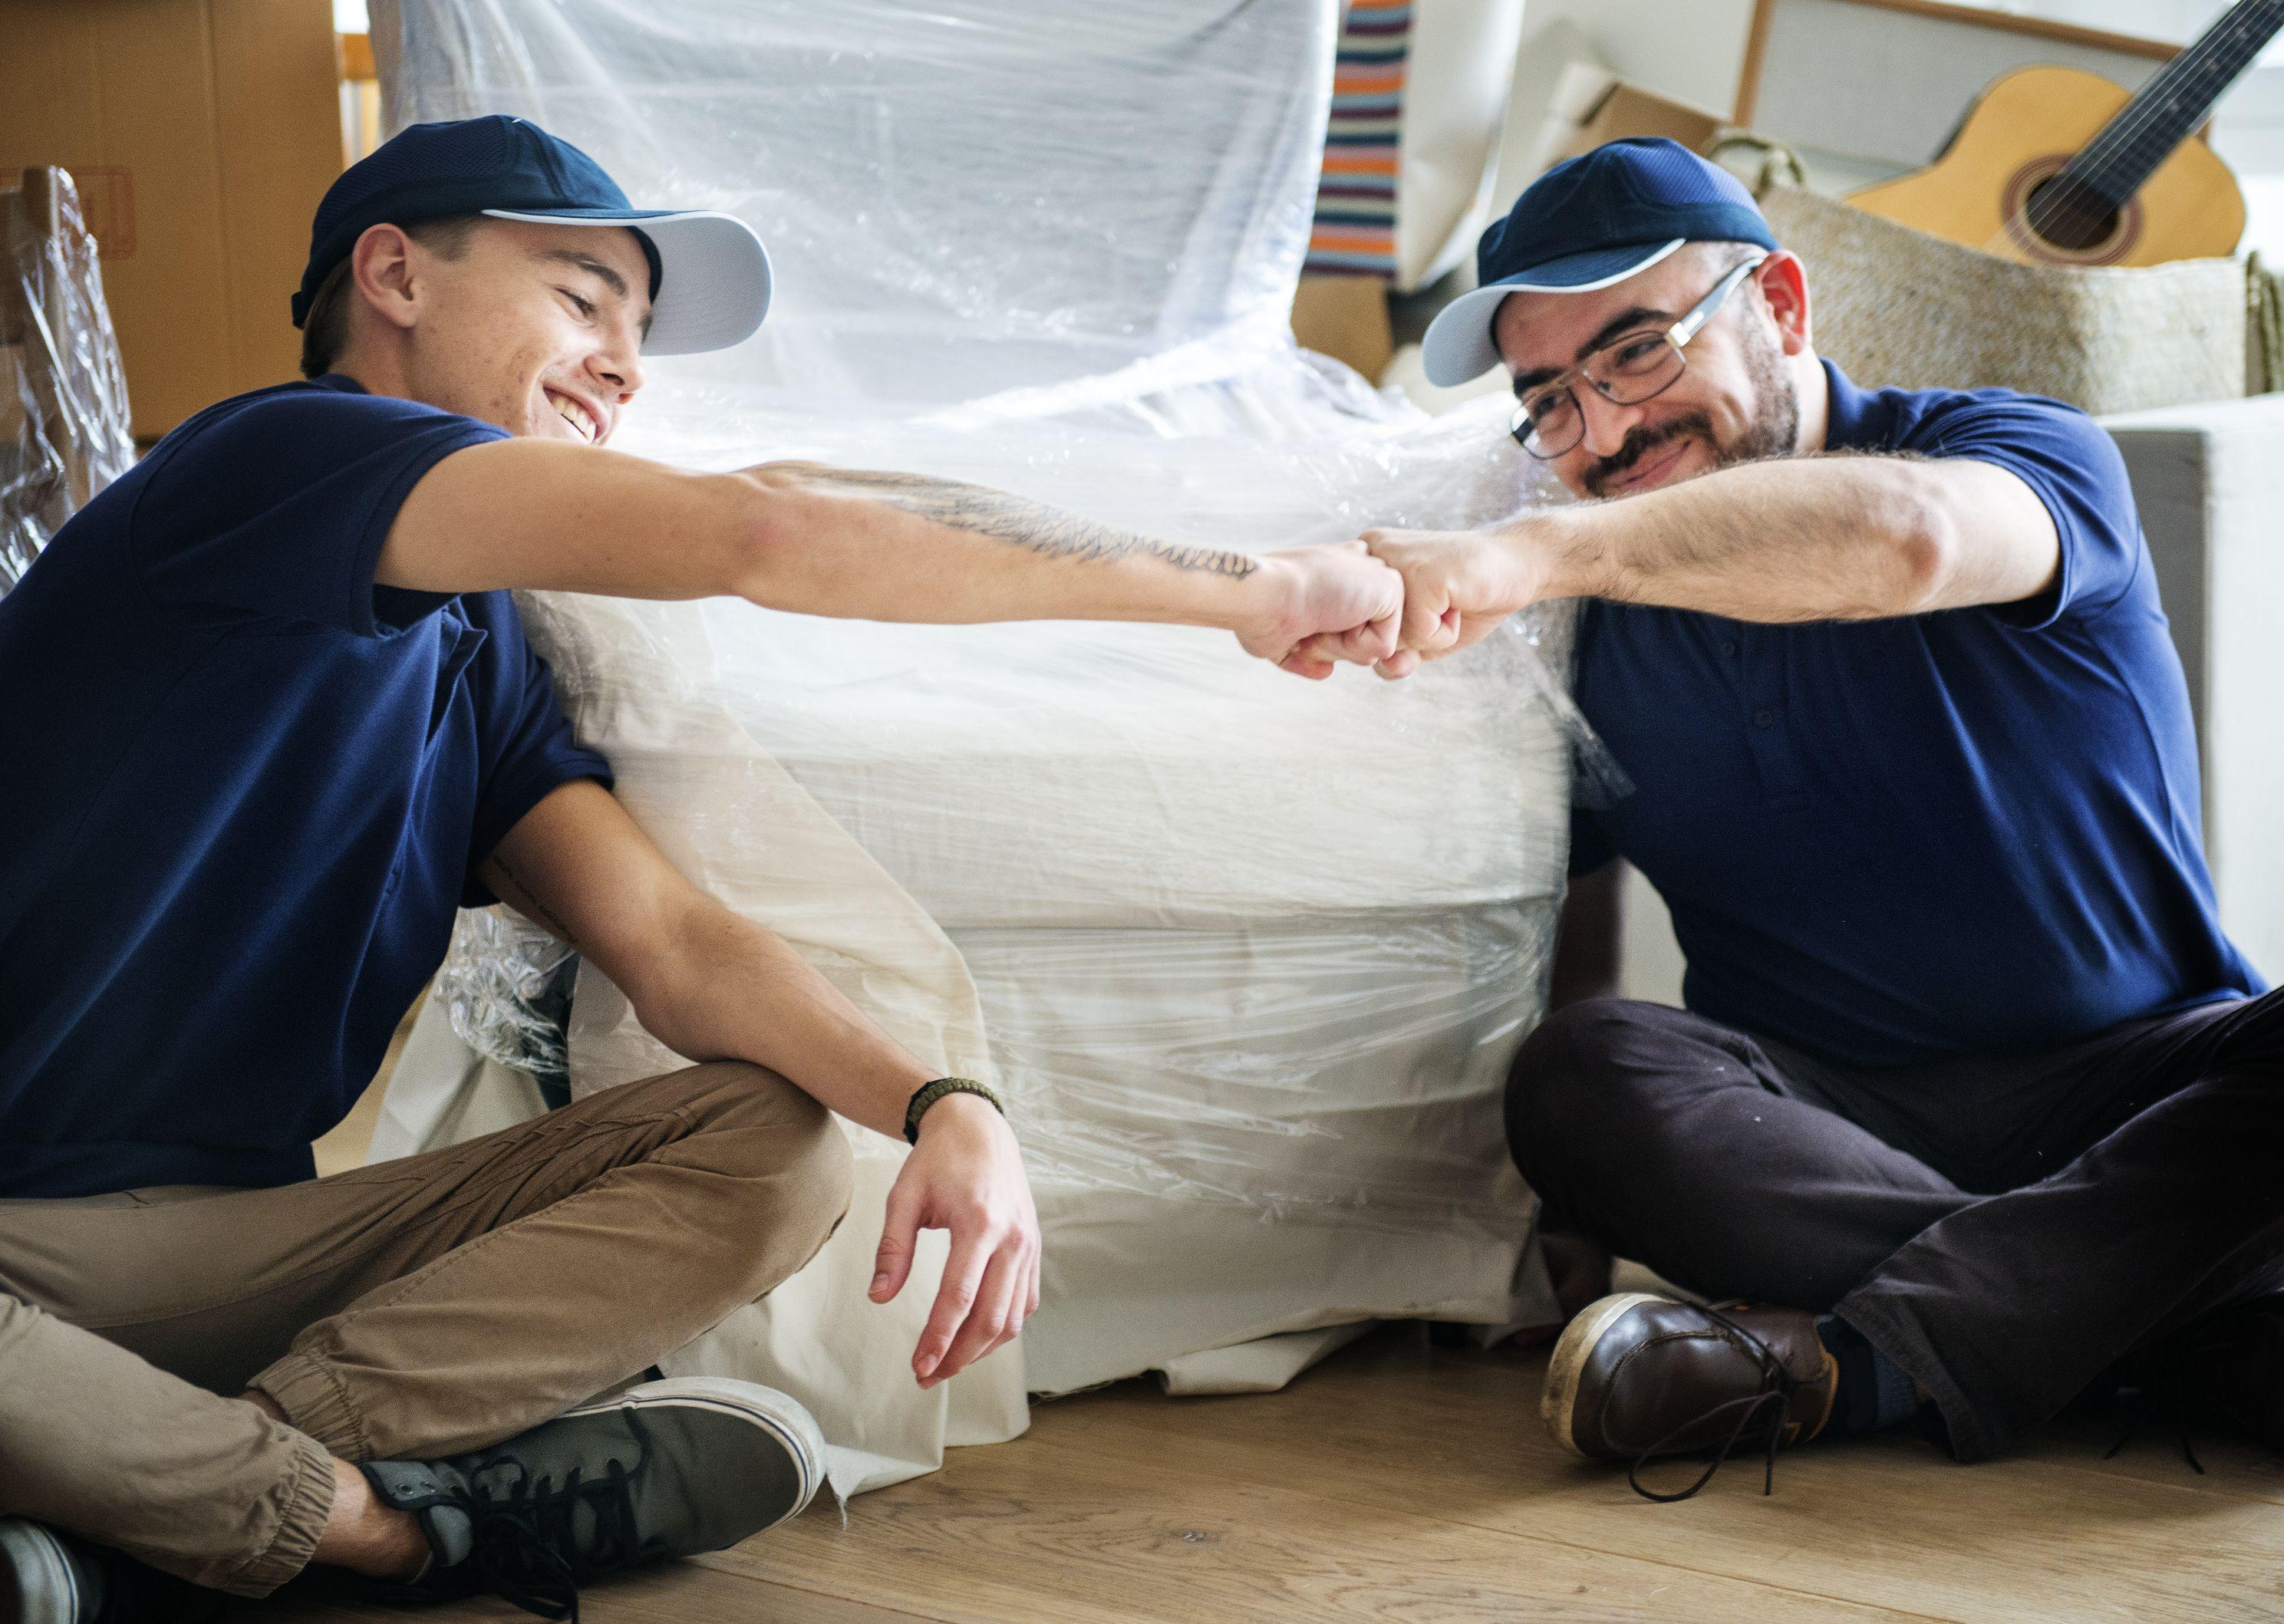 Furniture delivery service concept